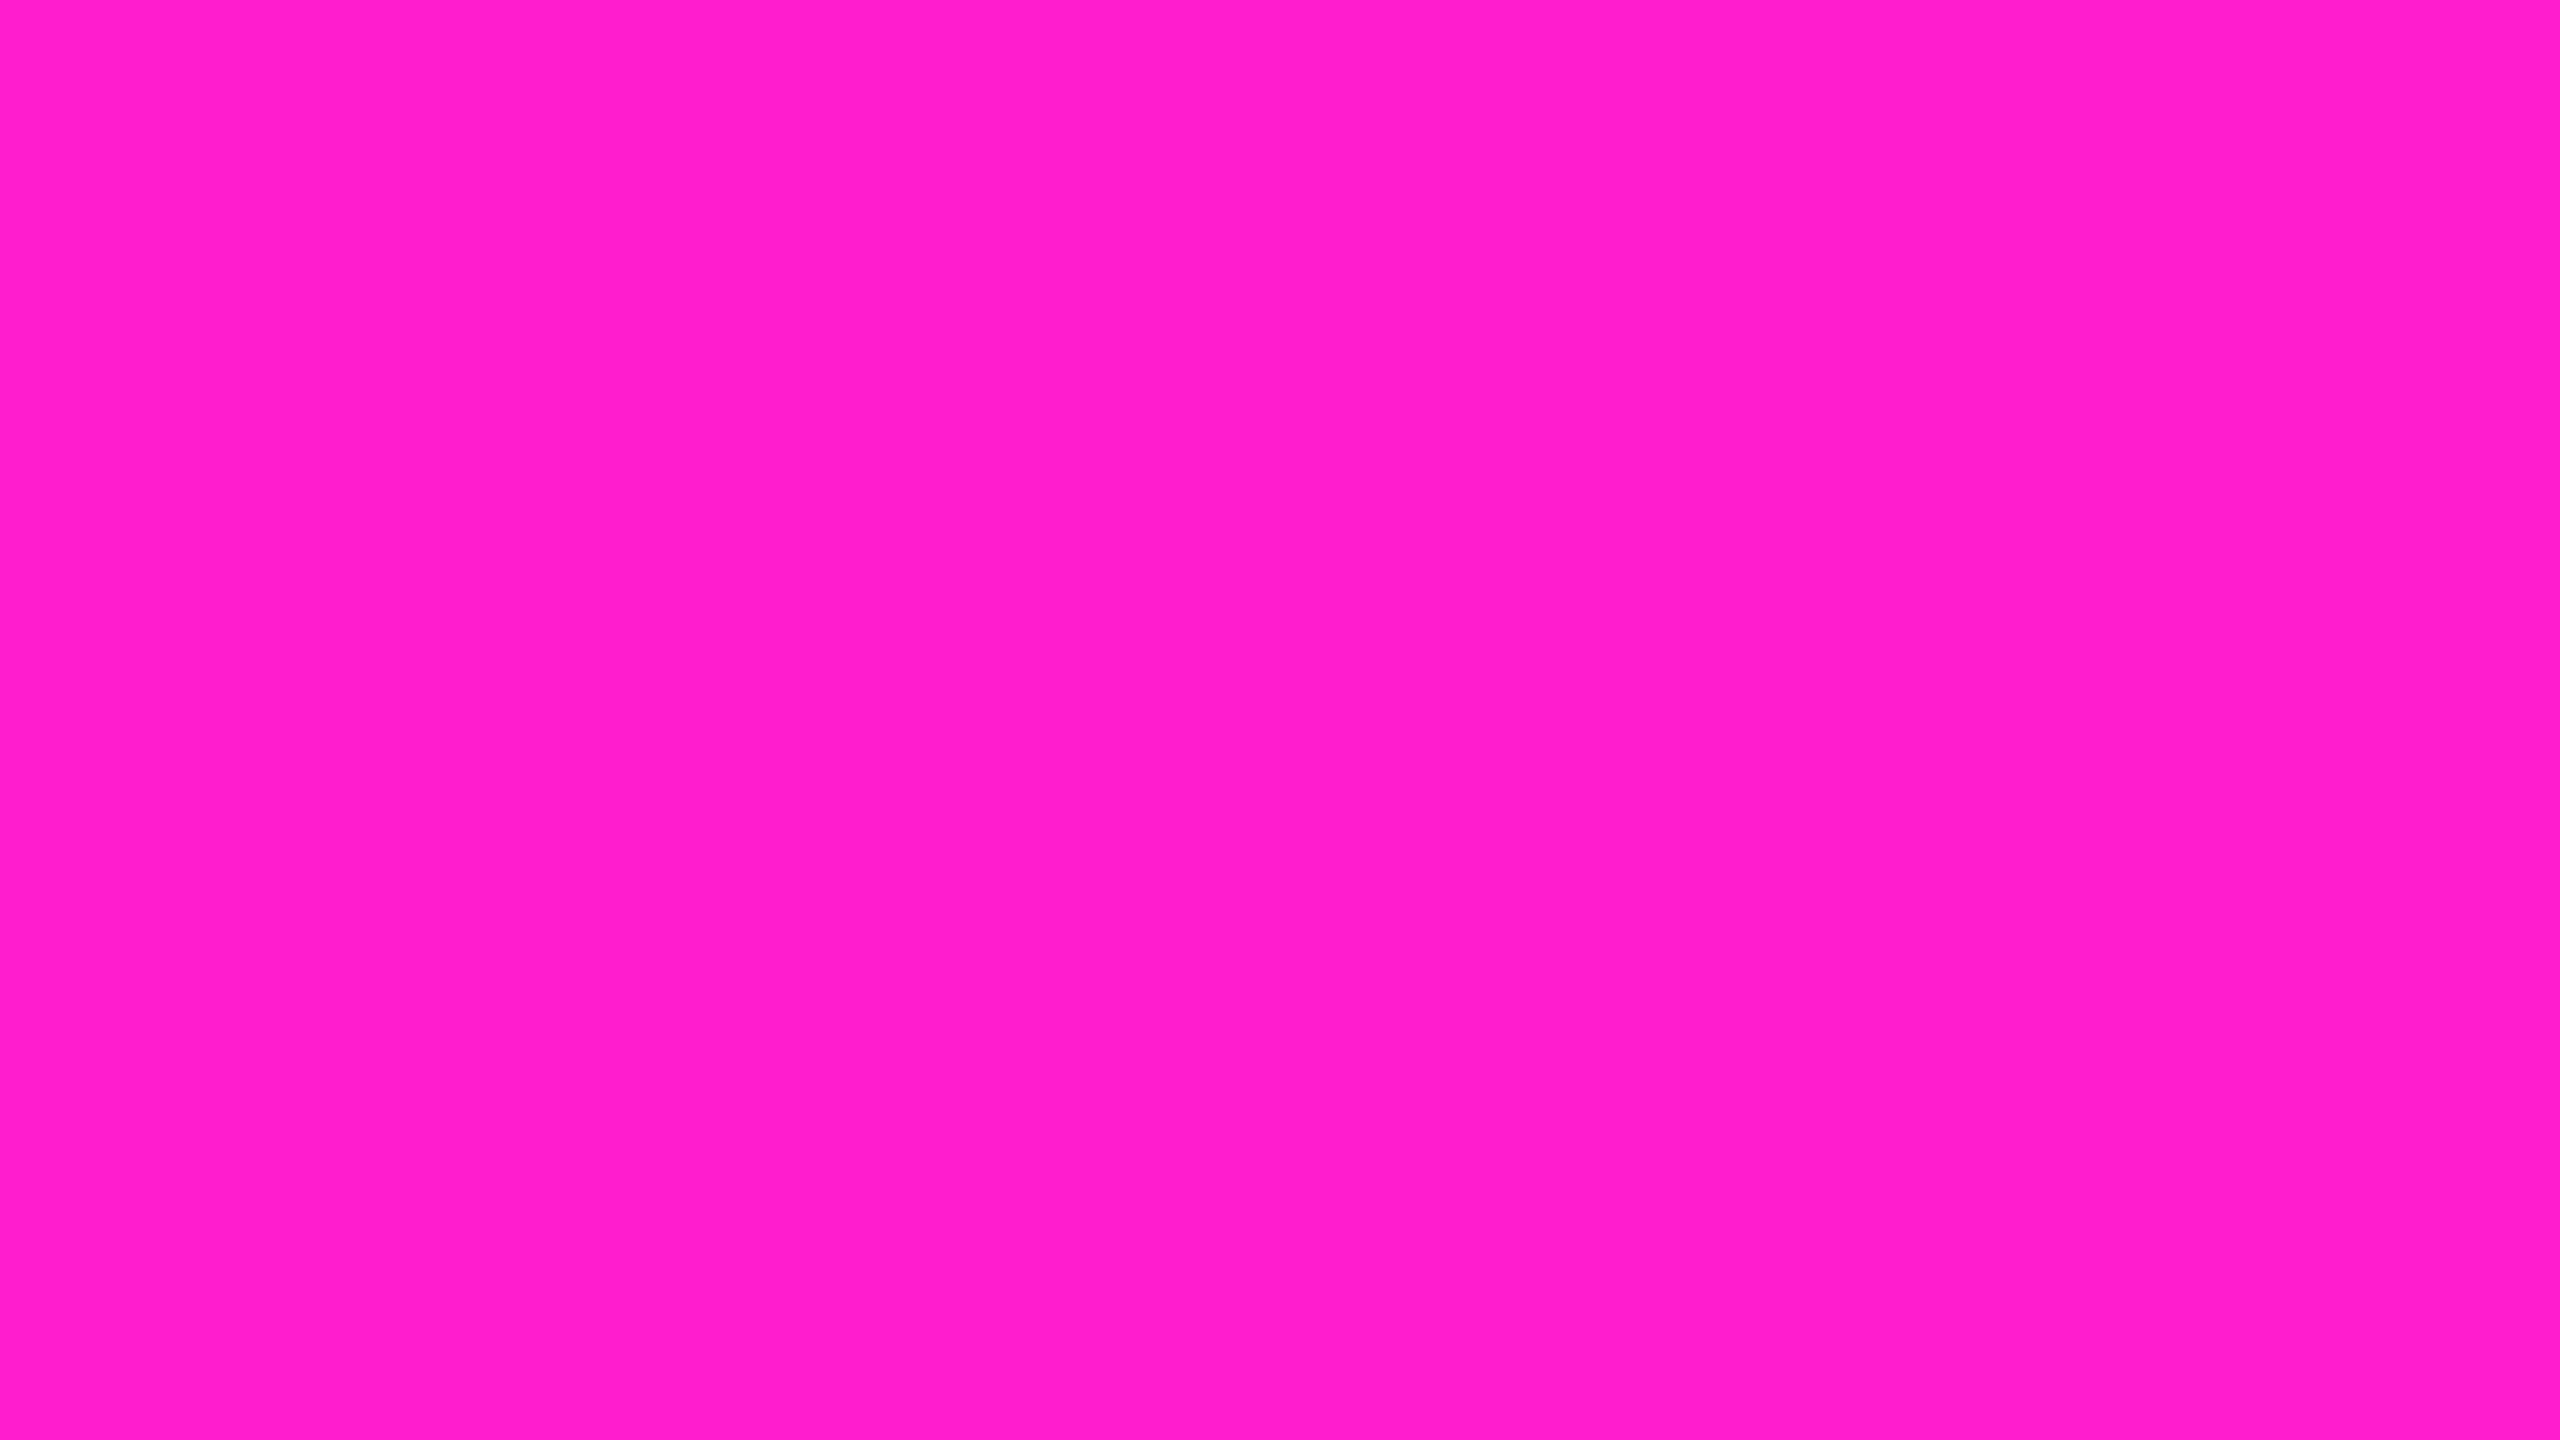 2560x1440 Hot Magenta Solid Color Background